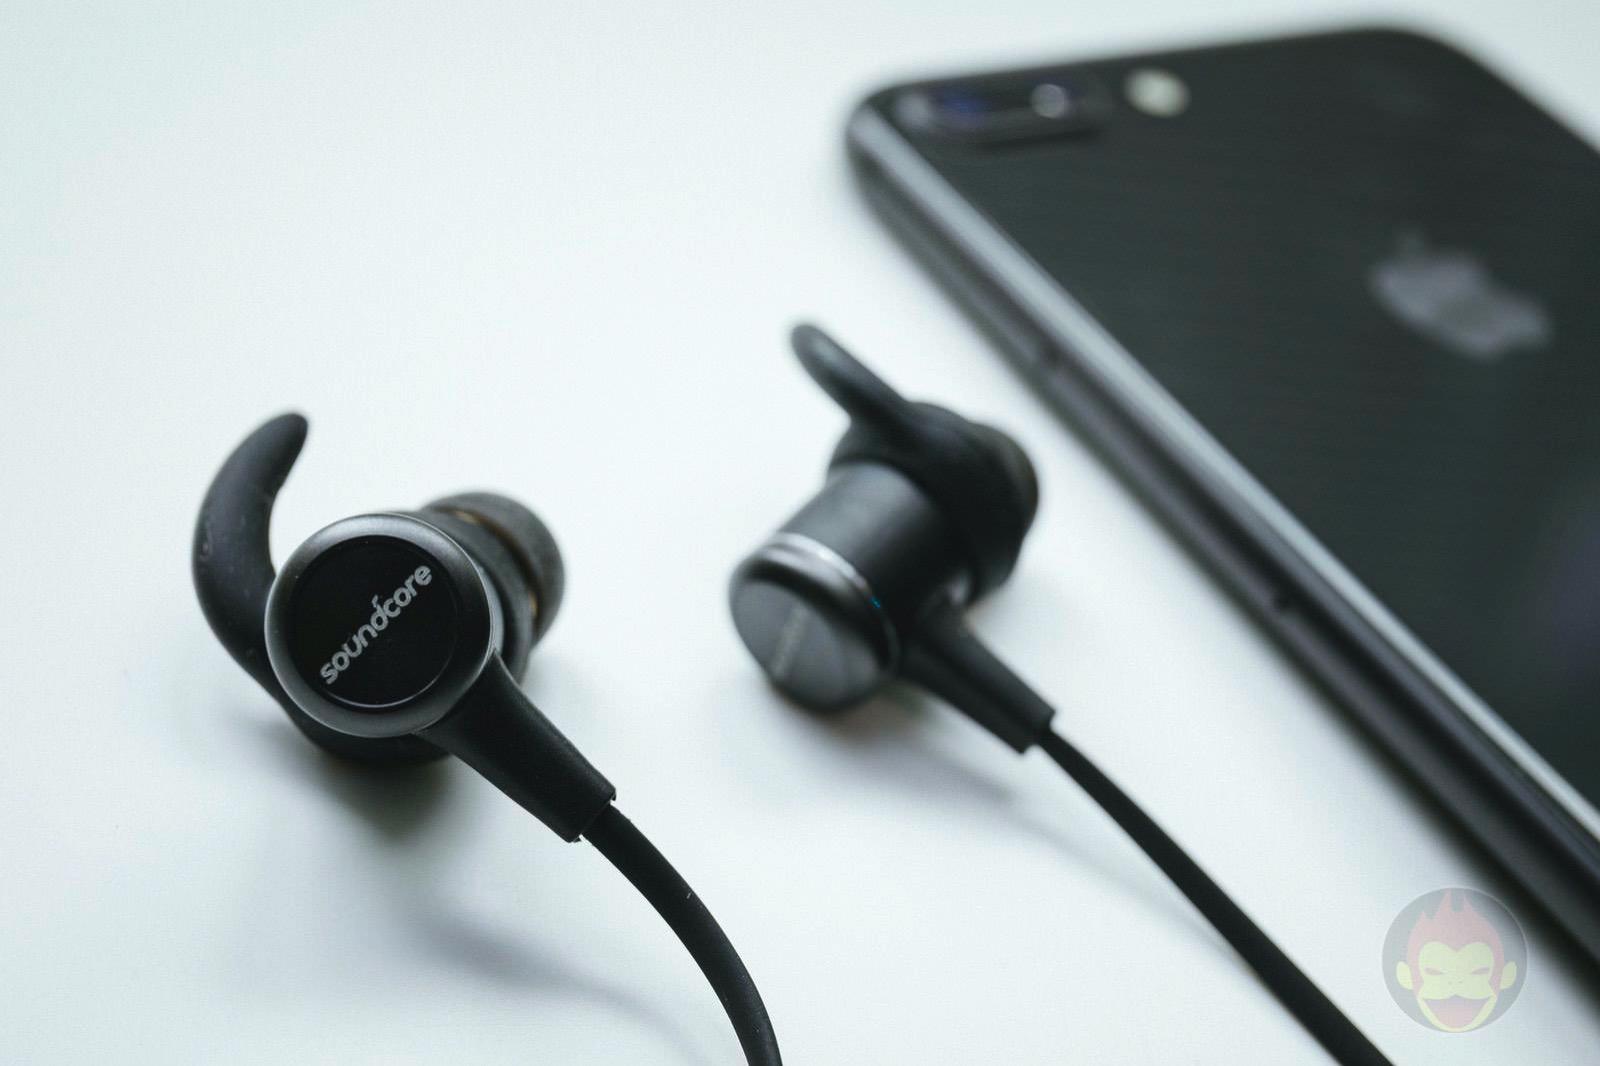 Anker Soundcore Spirit Sweatguard earphones 08